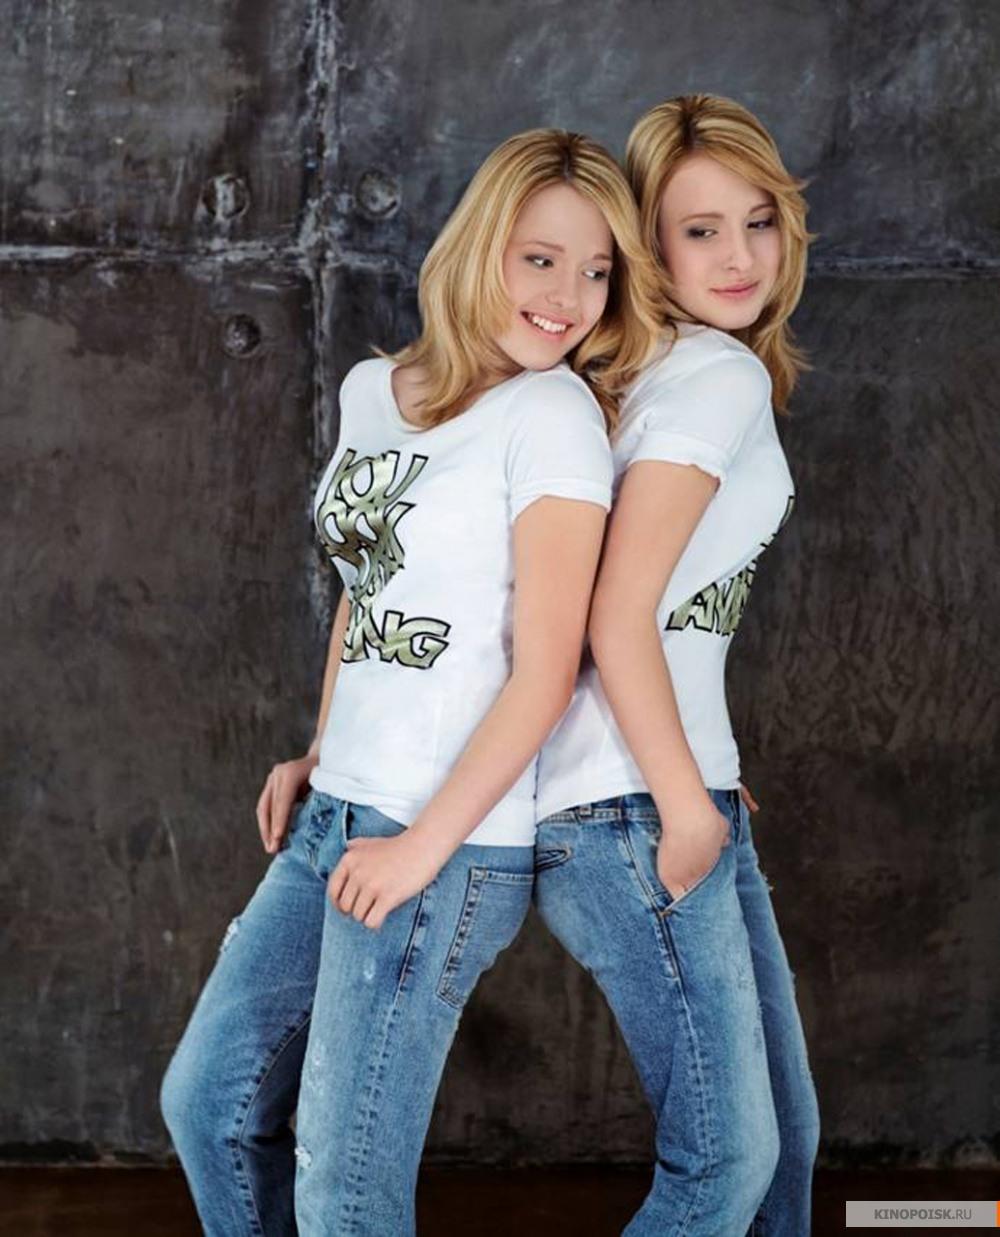 зрелые близняшки